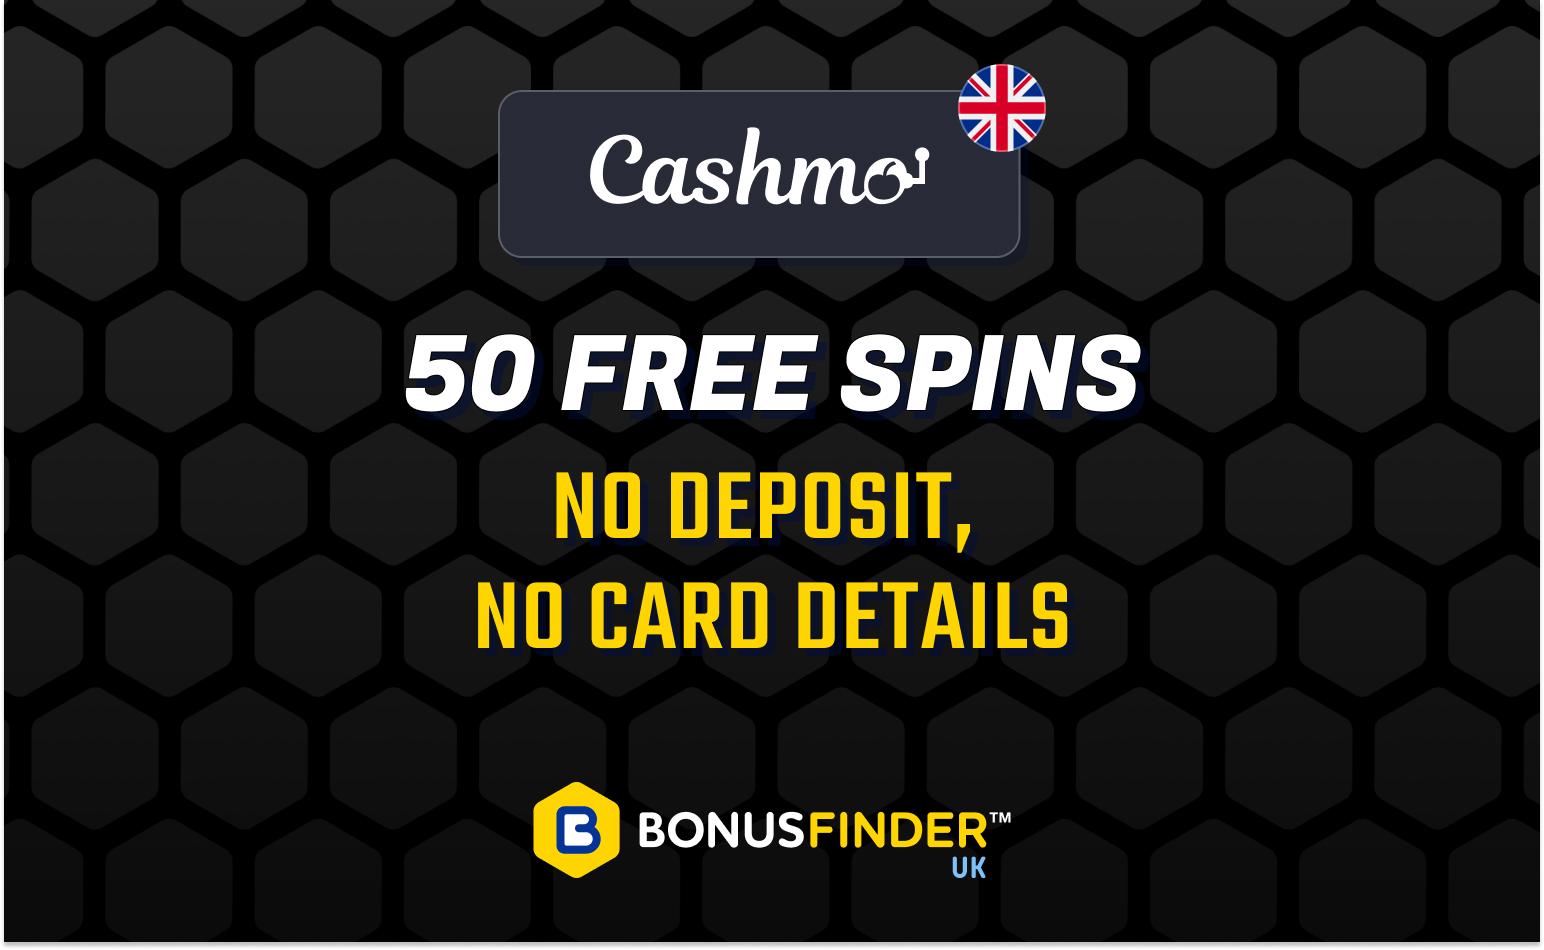 free spins no deposit no card details